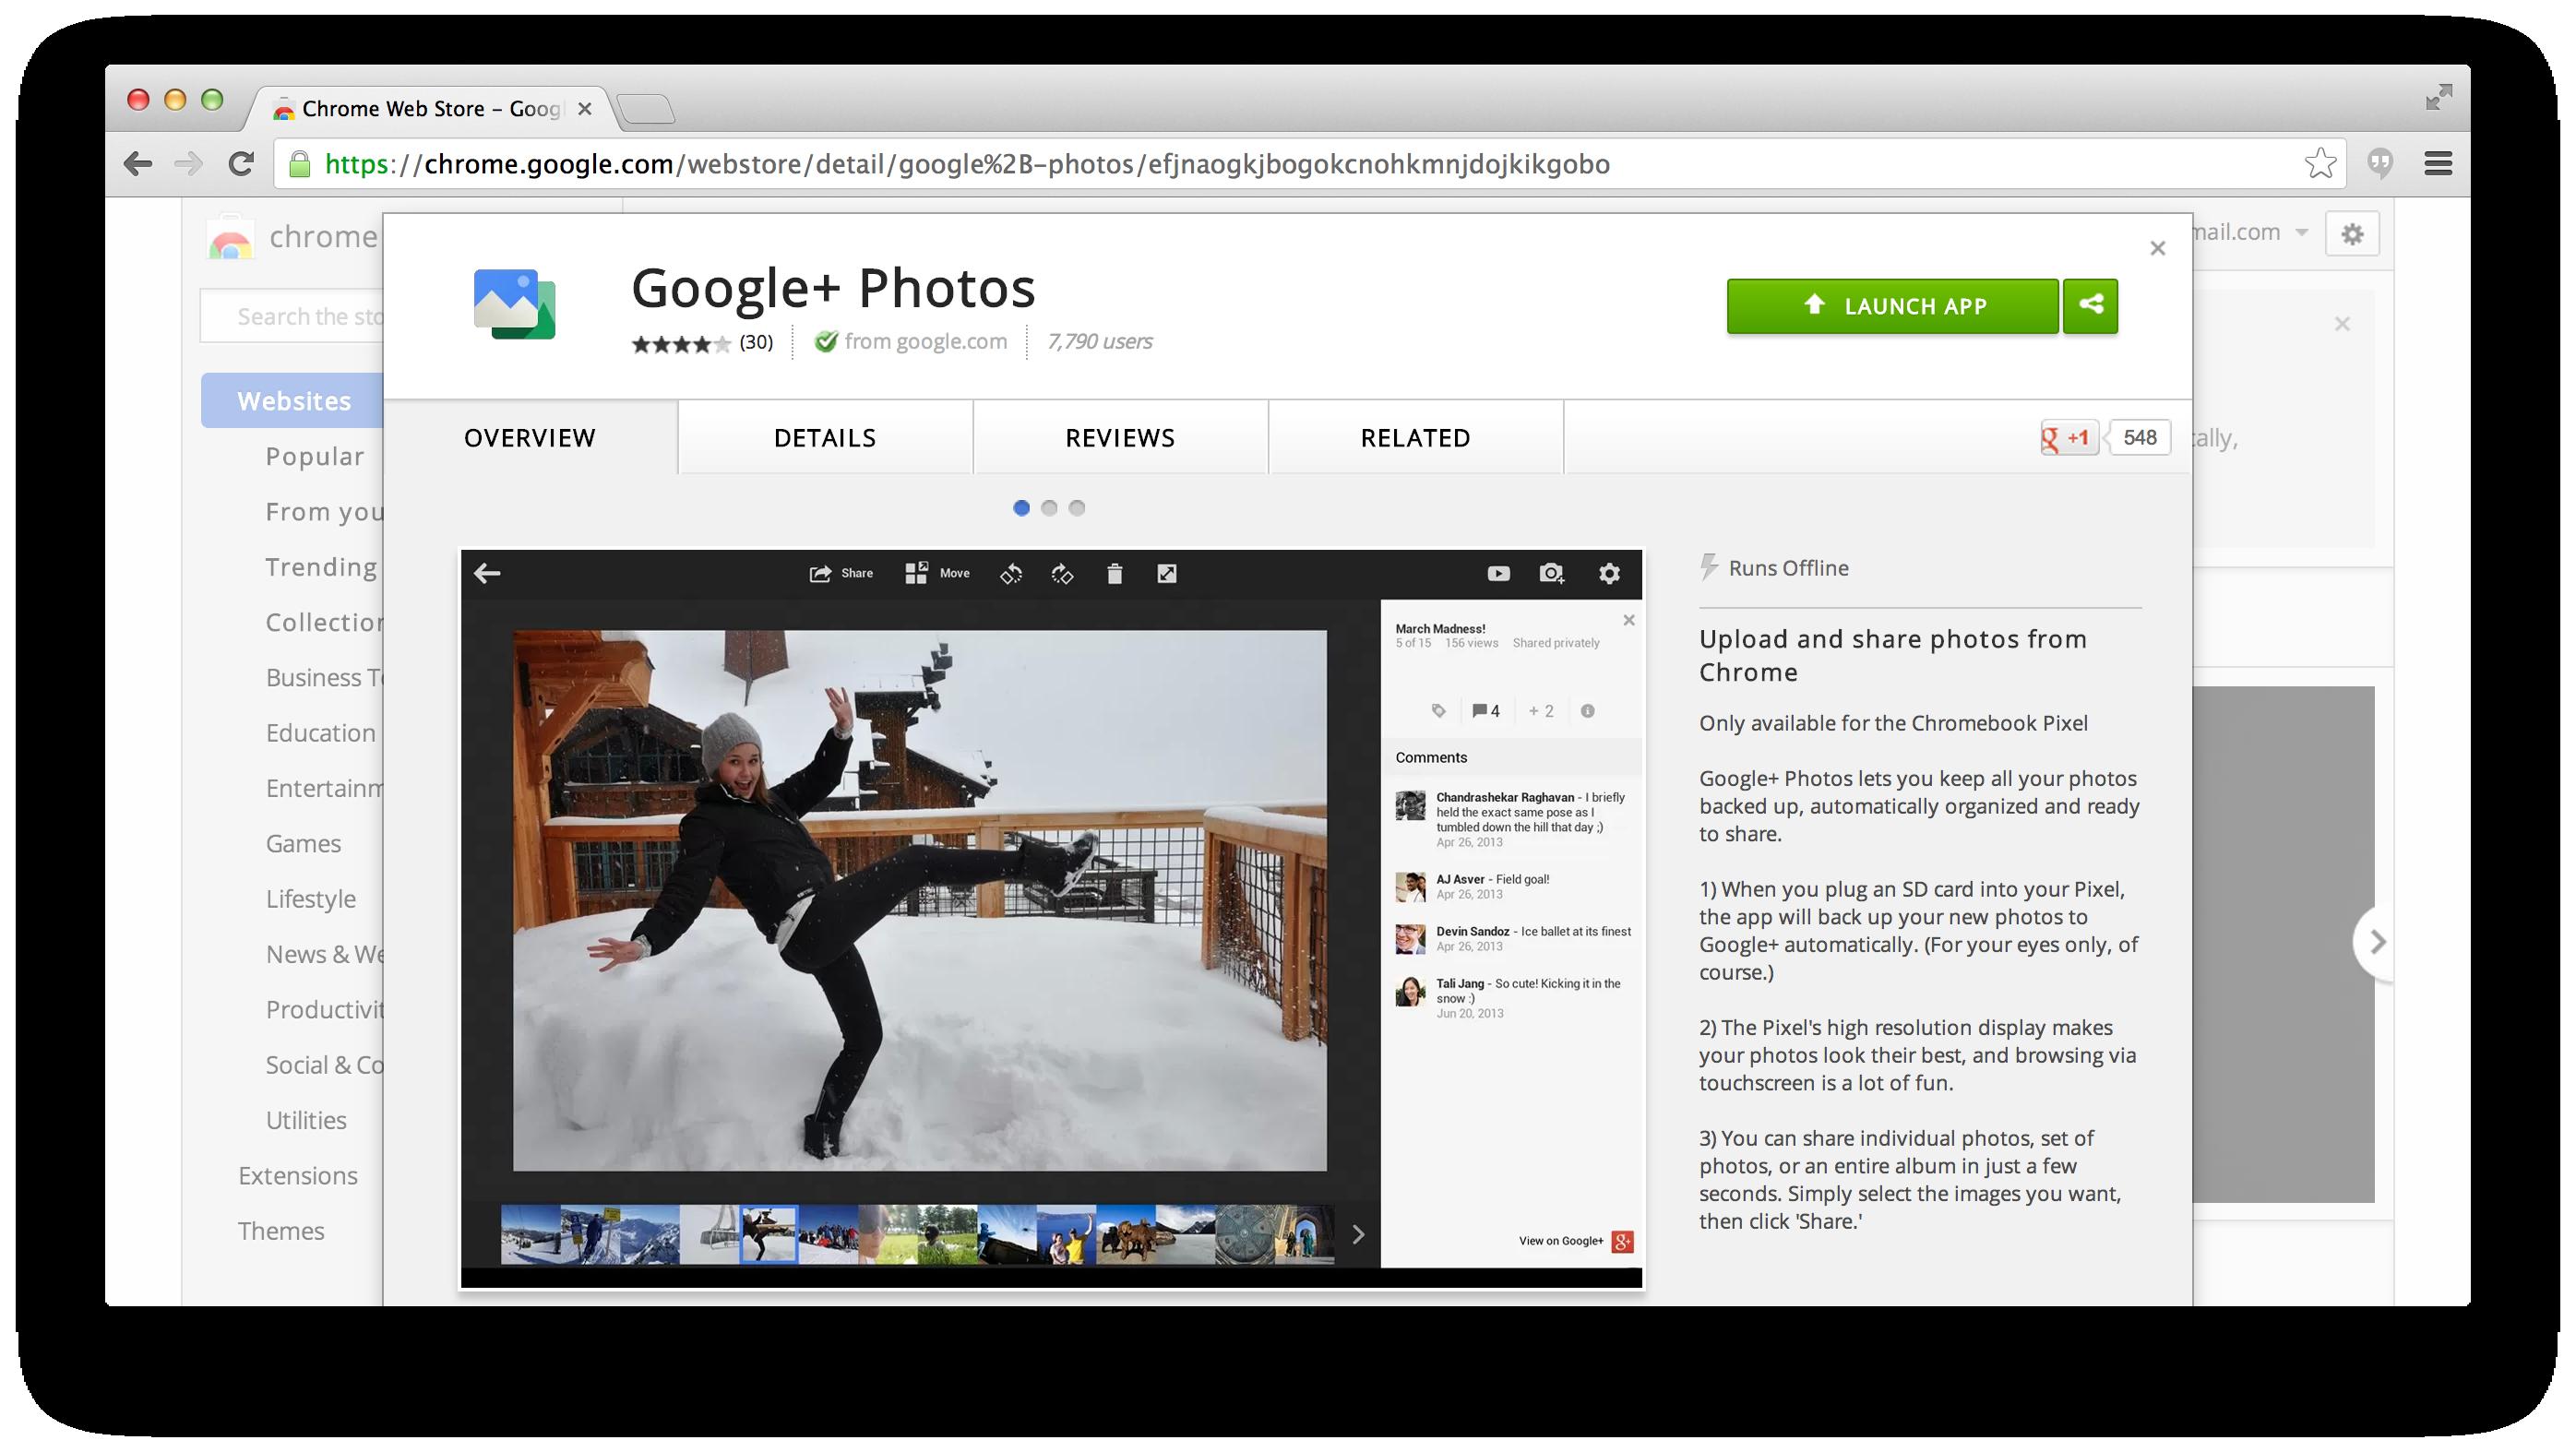 Google-Plus-Photos-App-Mac